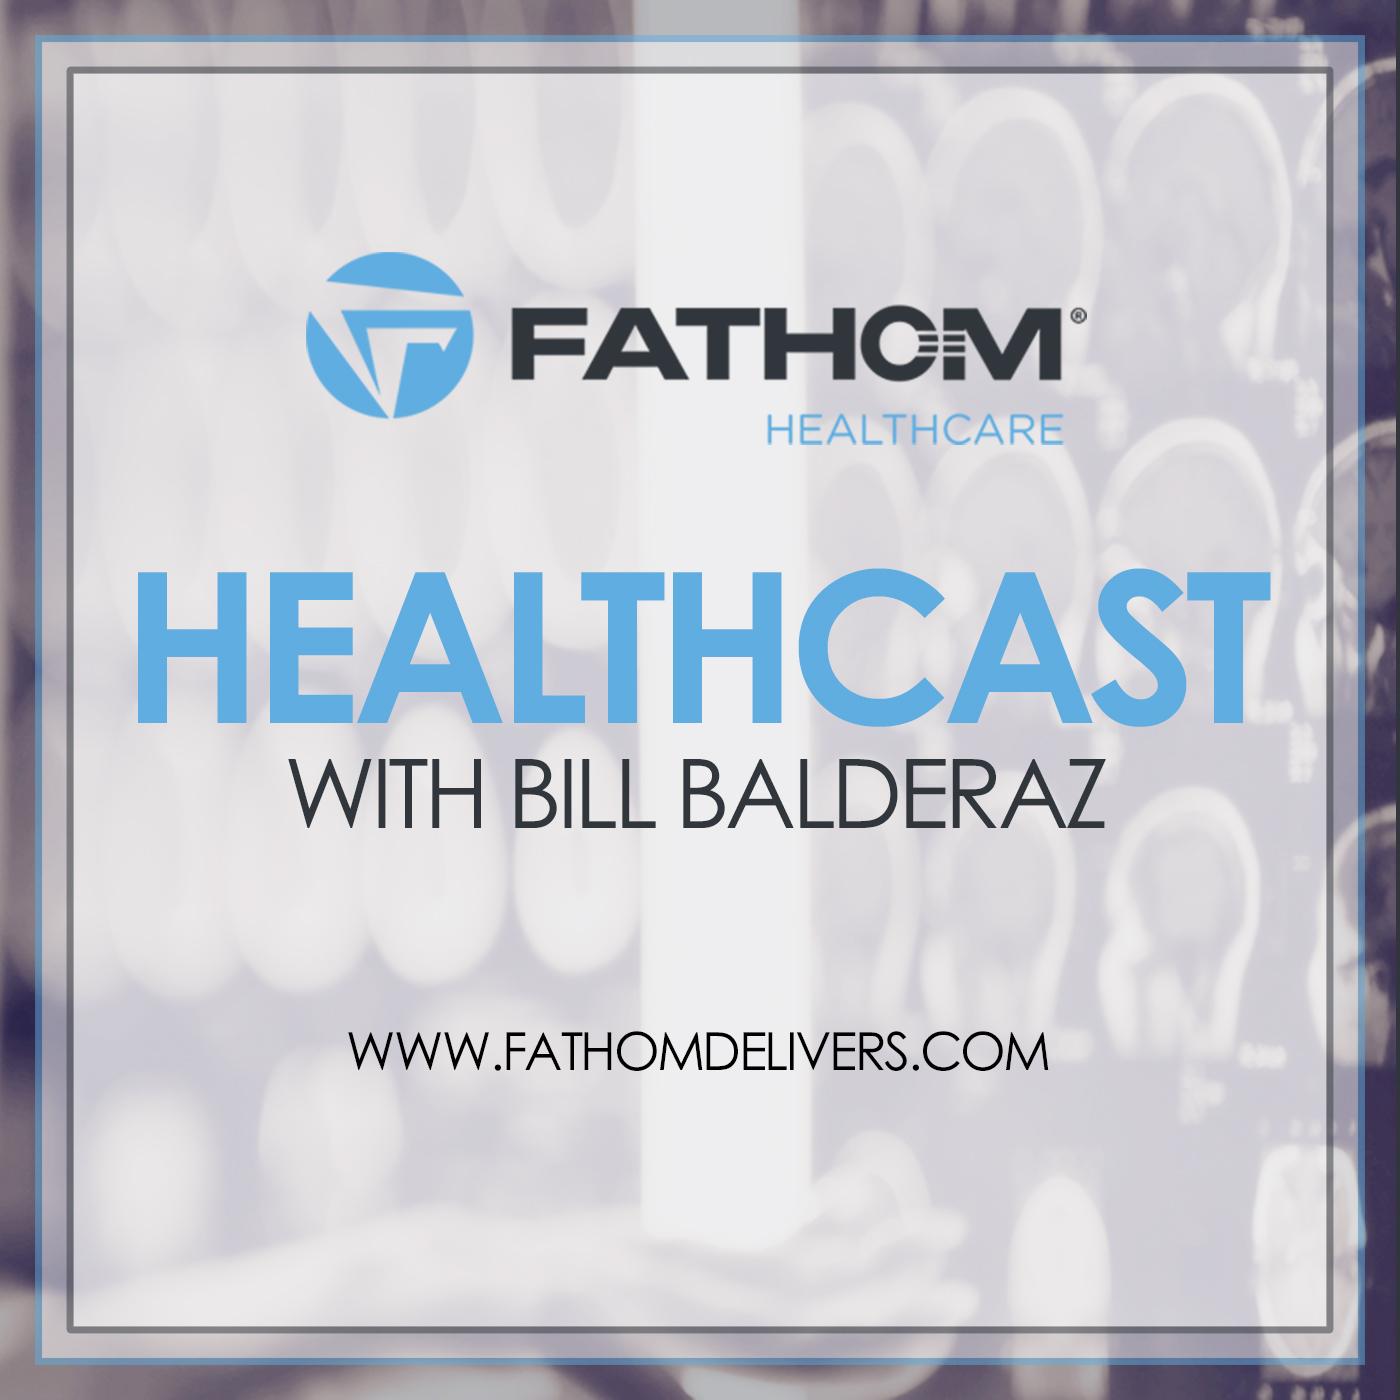 Fathom Healthcare Healthcast